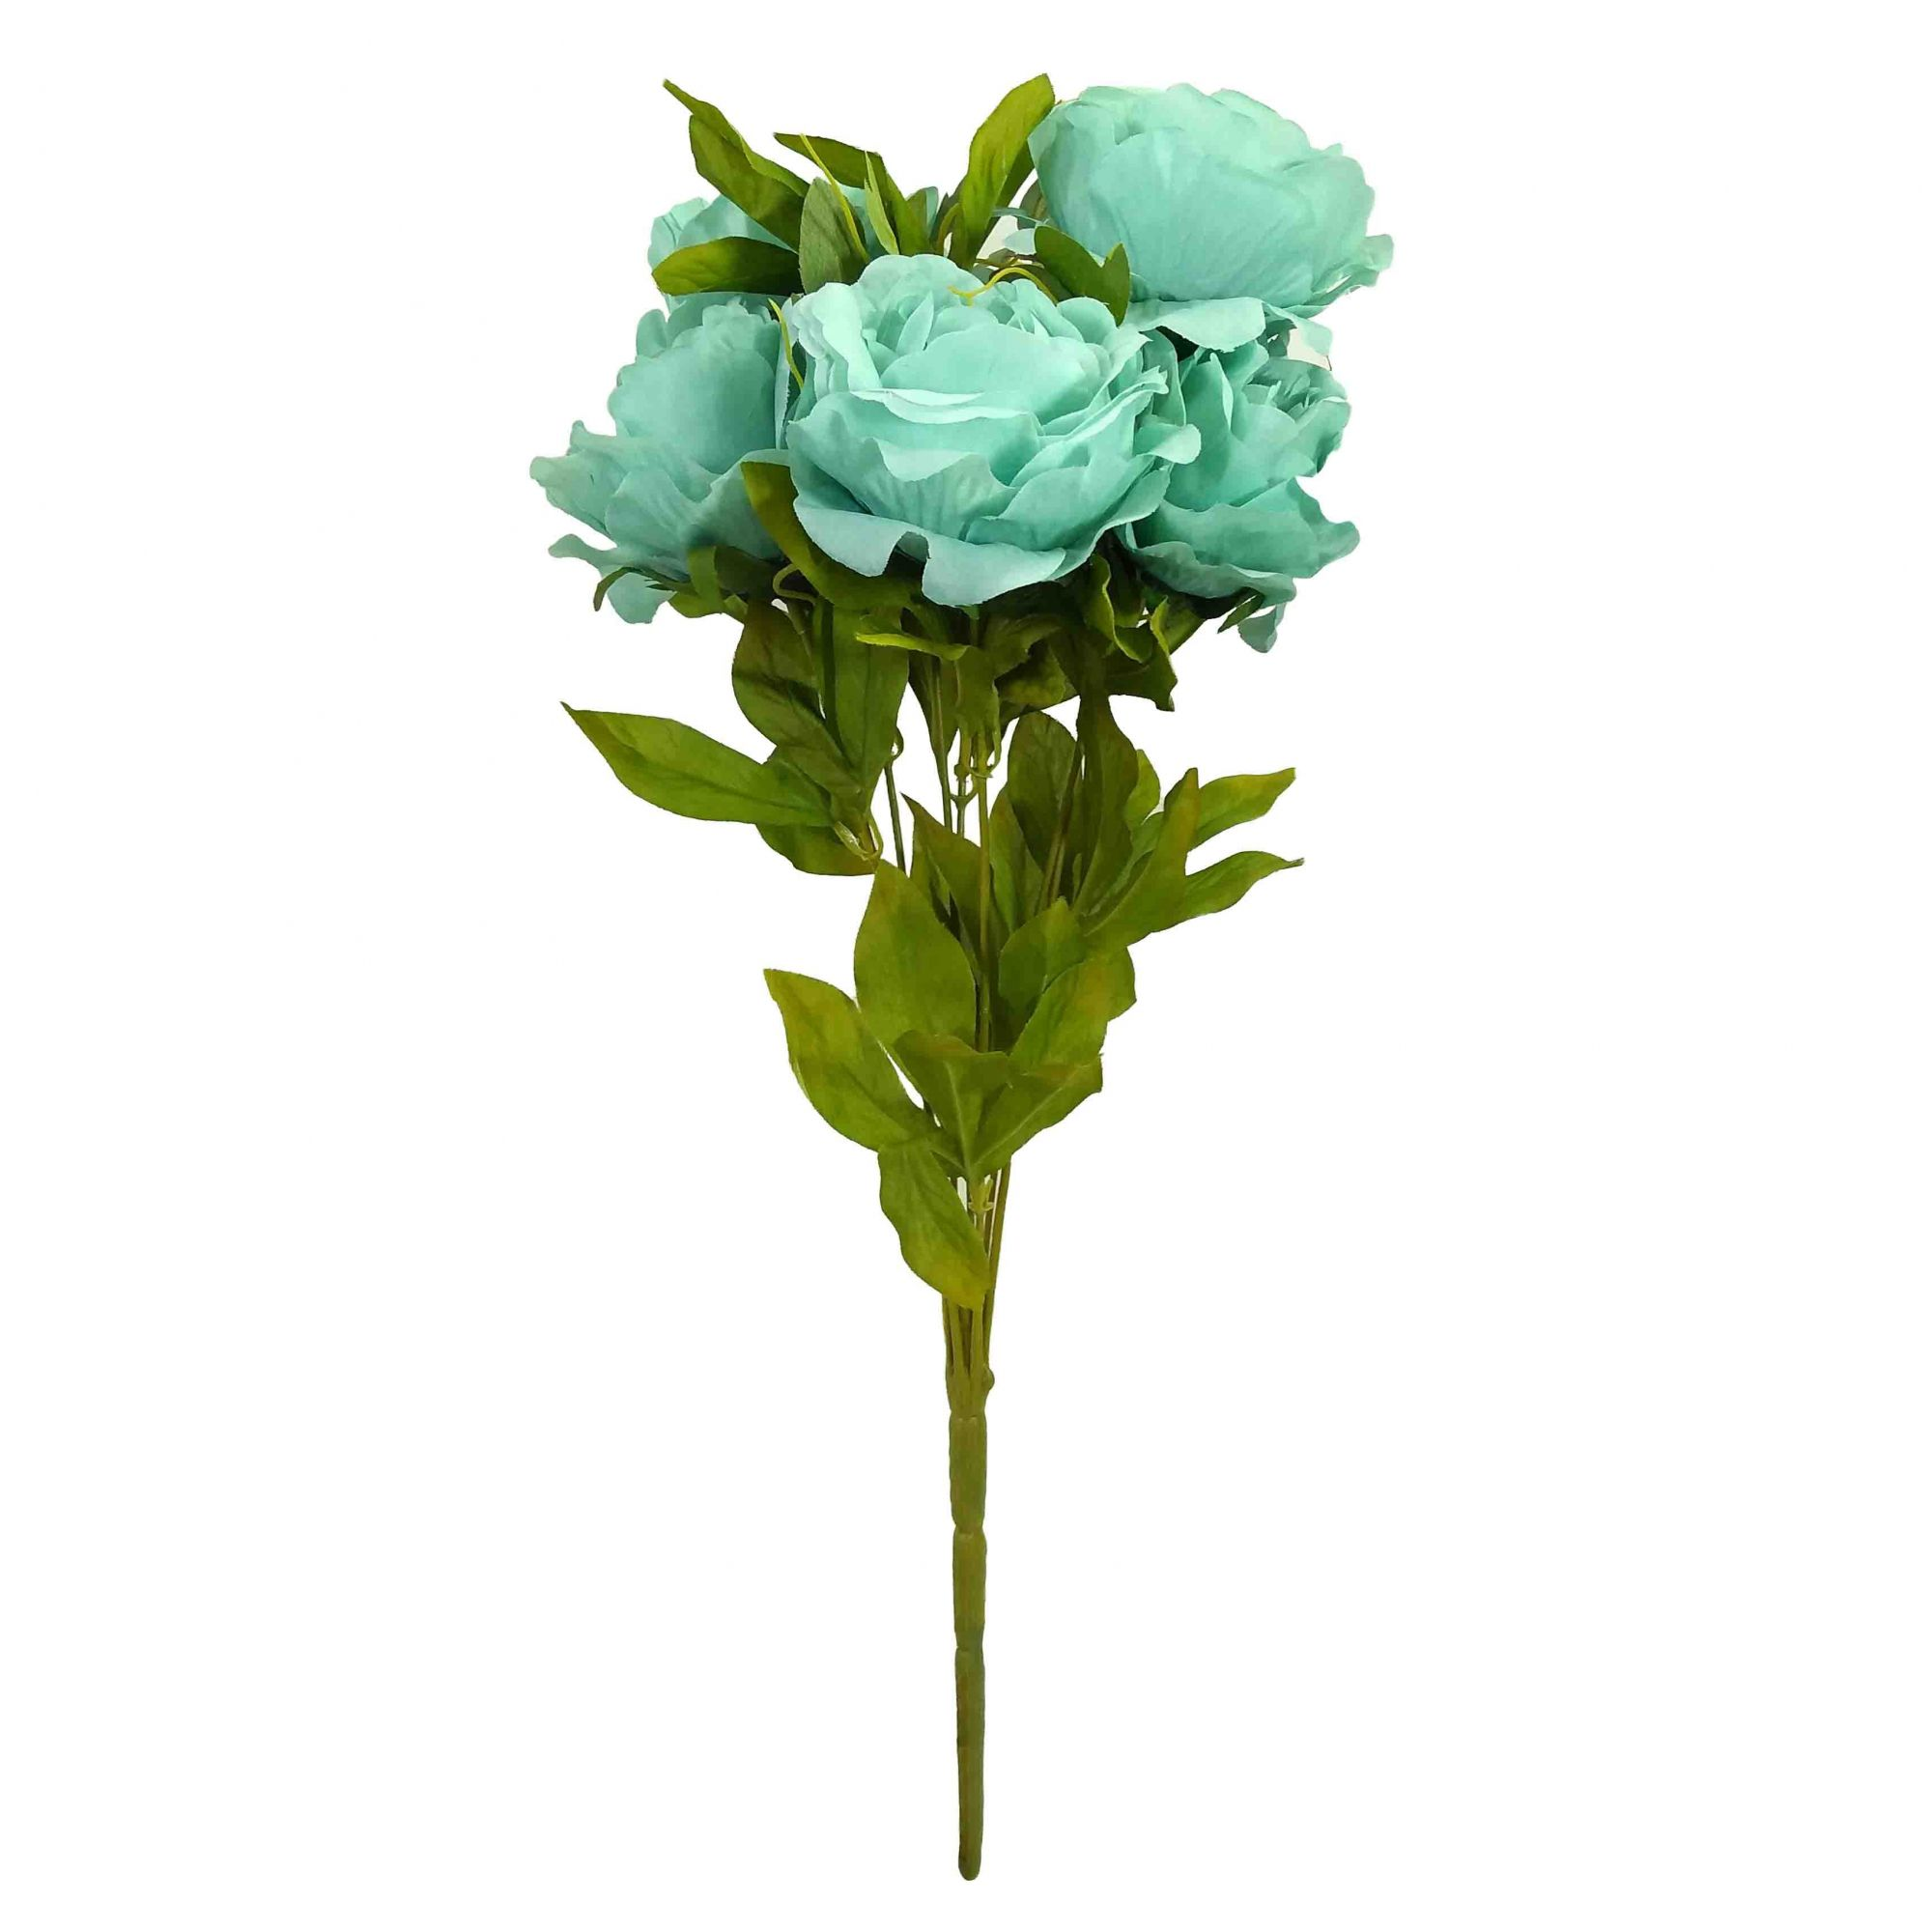 Flor Peonia Cor Azul Outono Artificial Permanente 55CM 37199-003